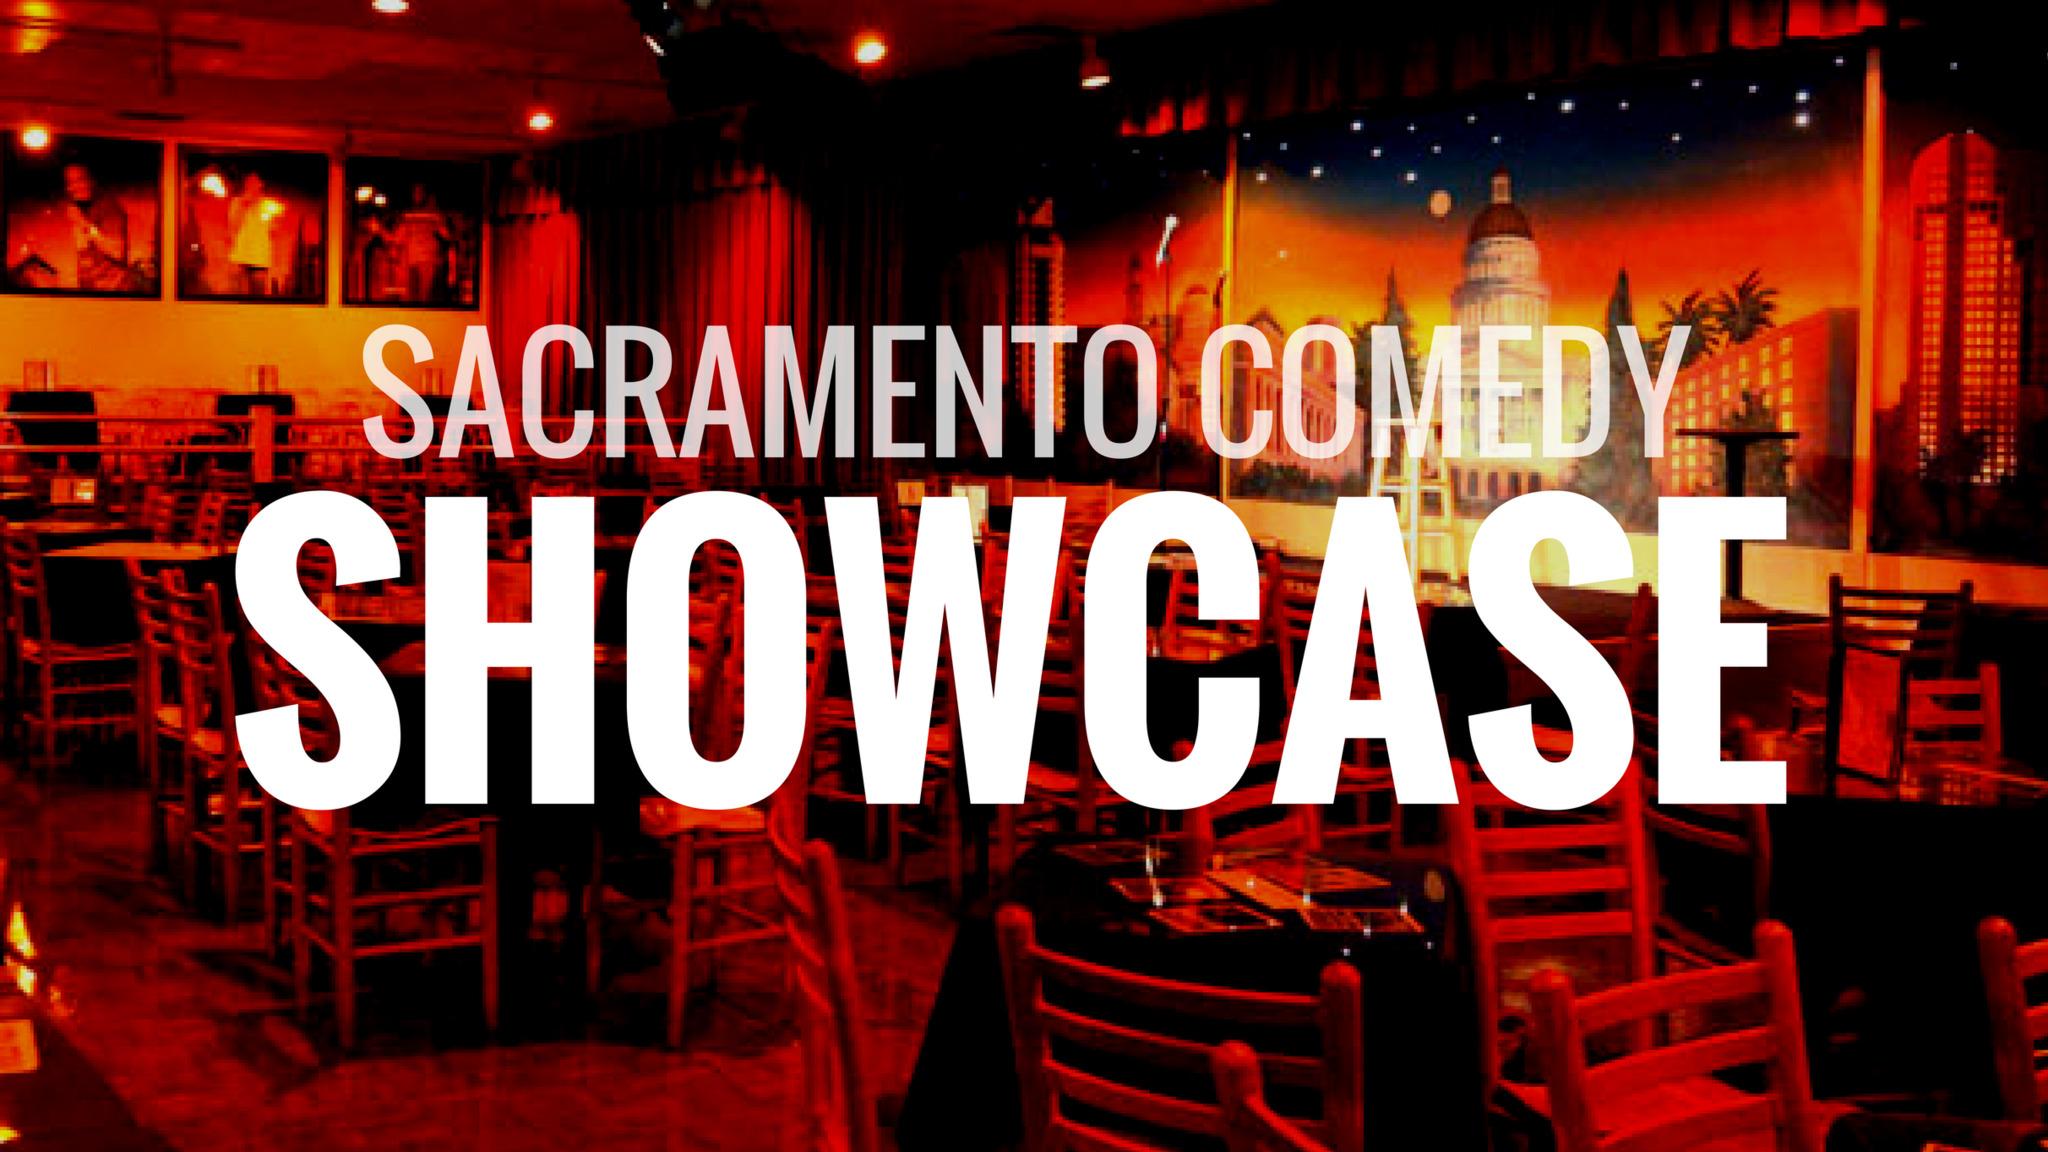 Sacramento Comedy Showcase